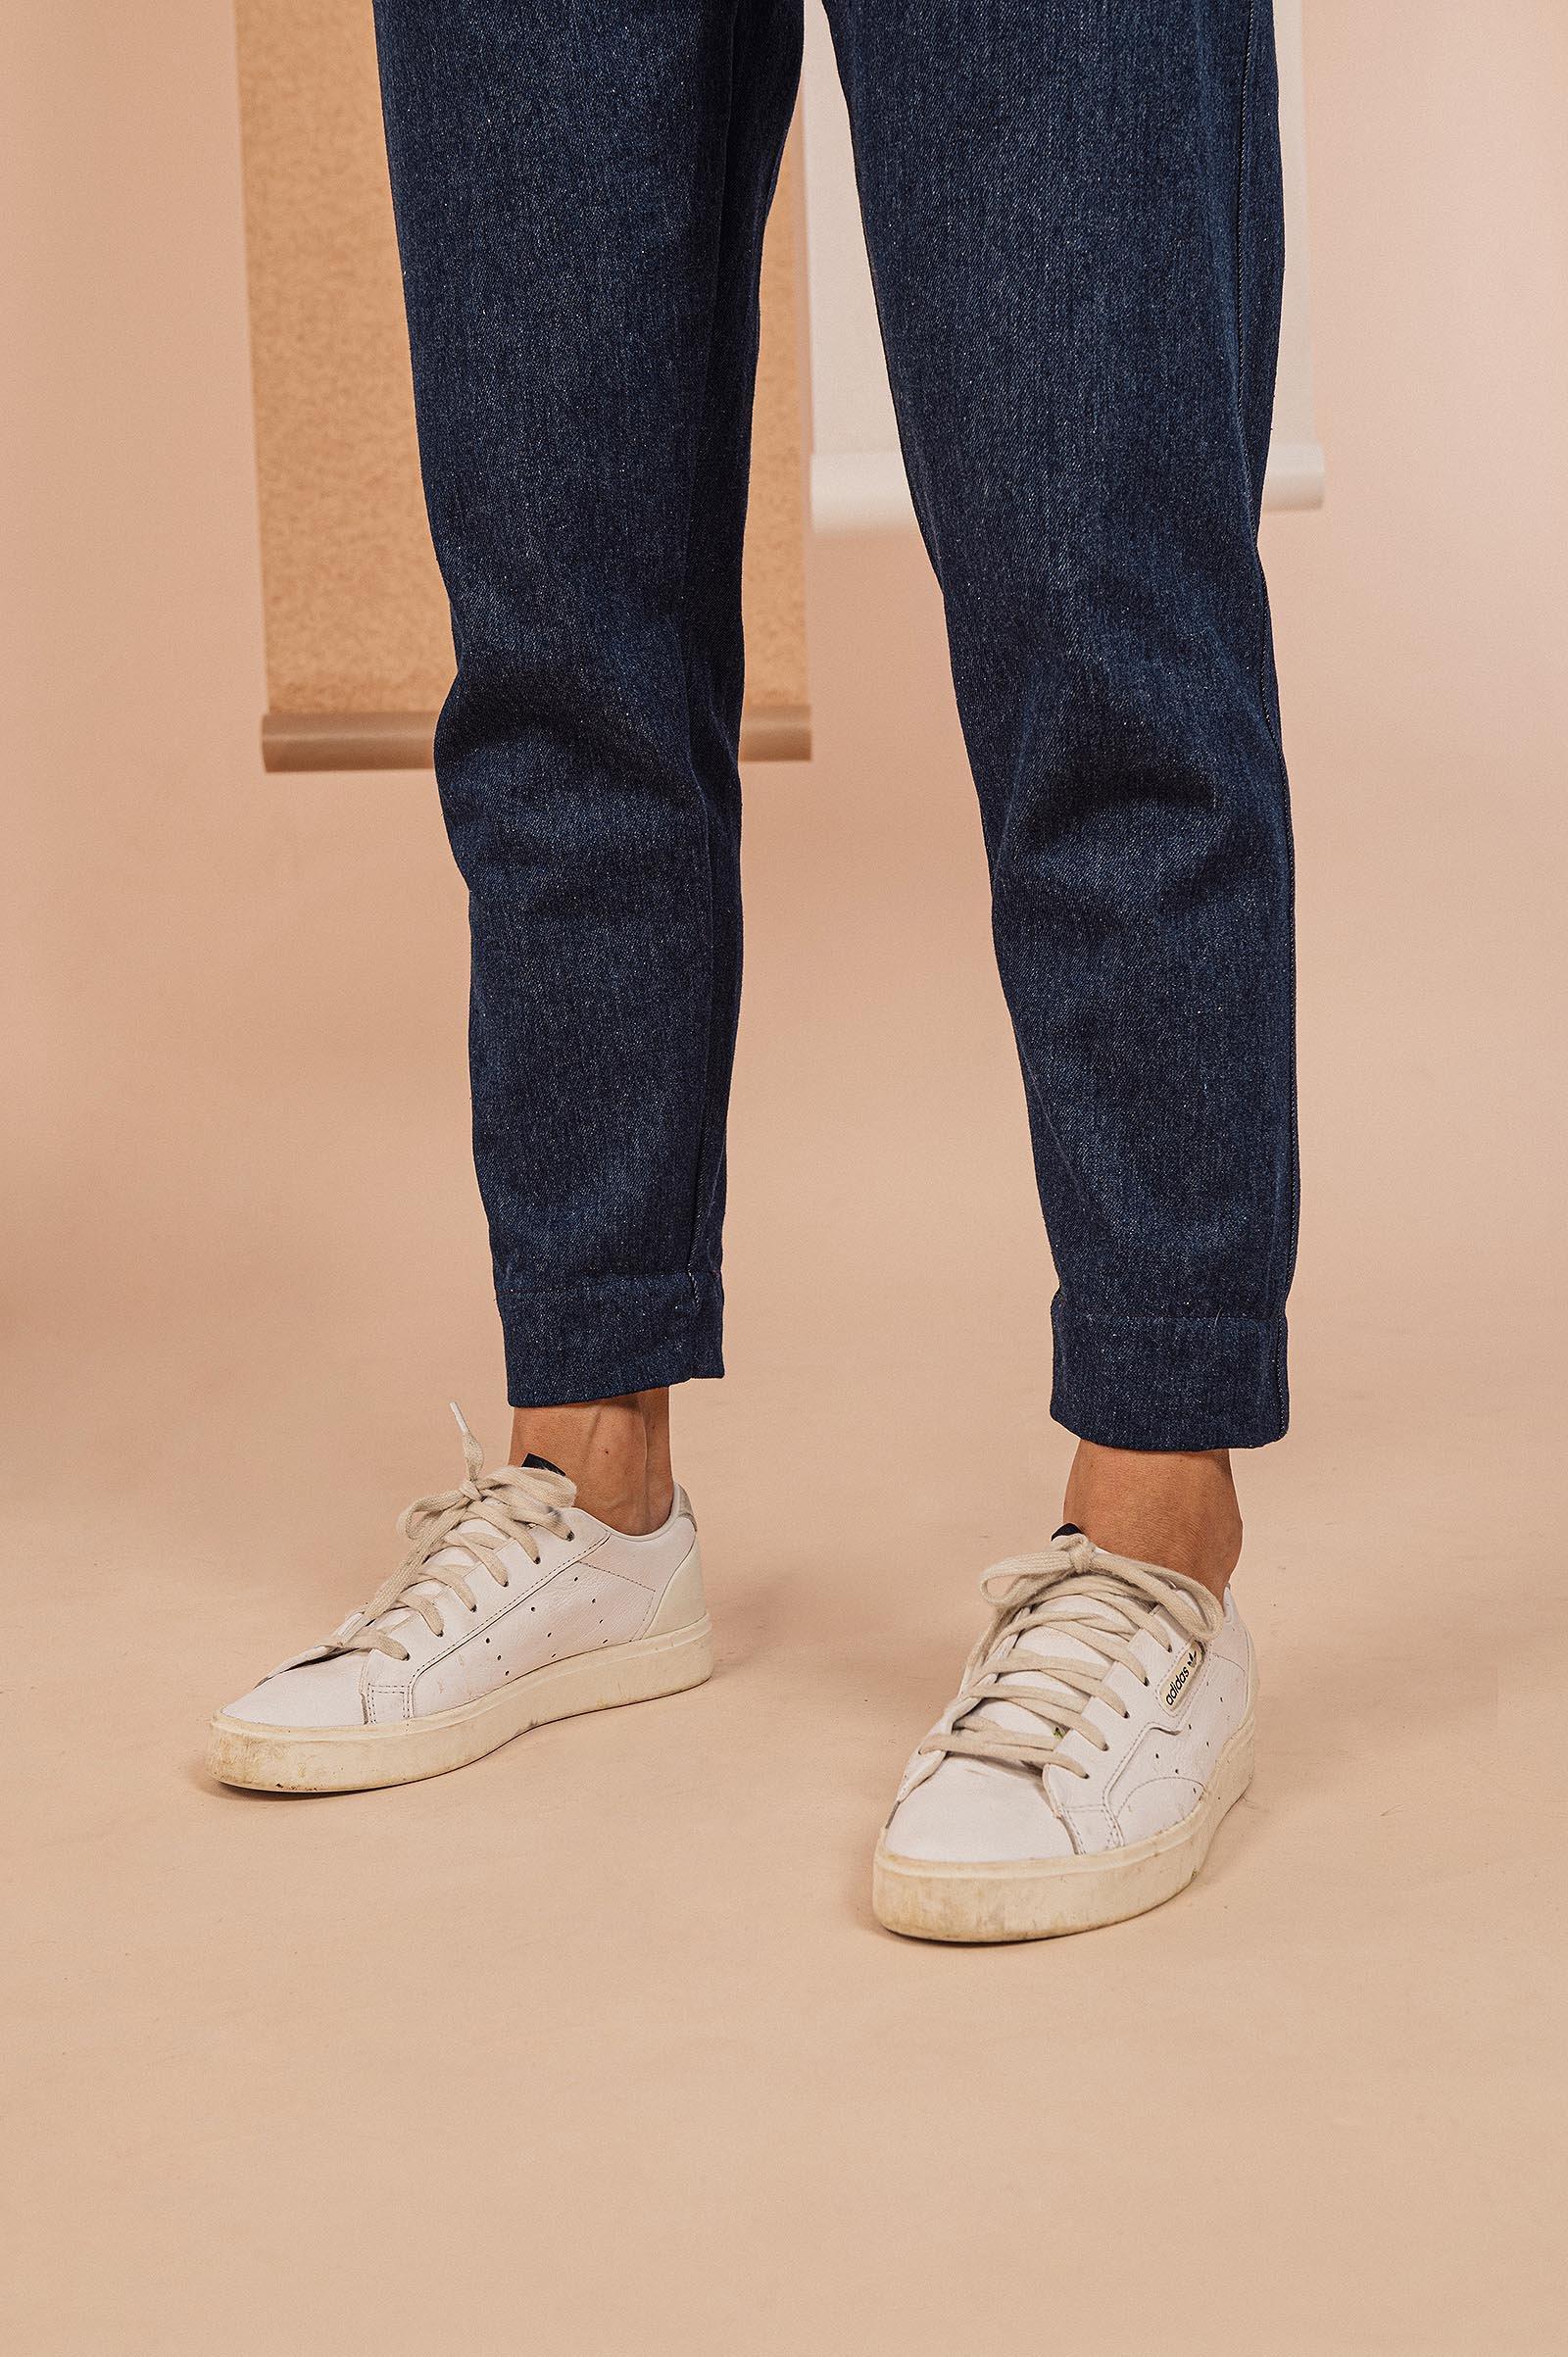 Kalhoty & šortky Gala blue jeans